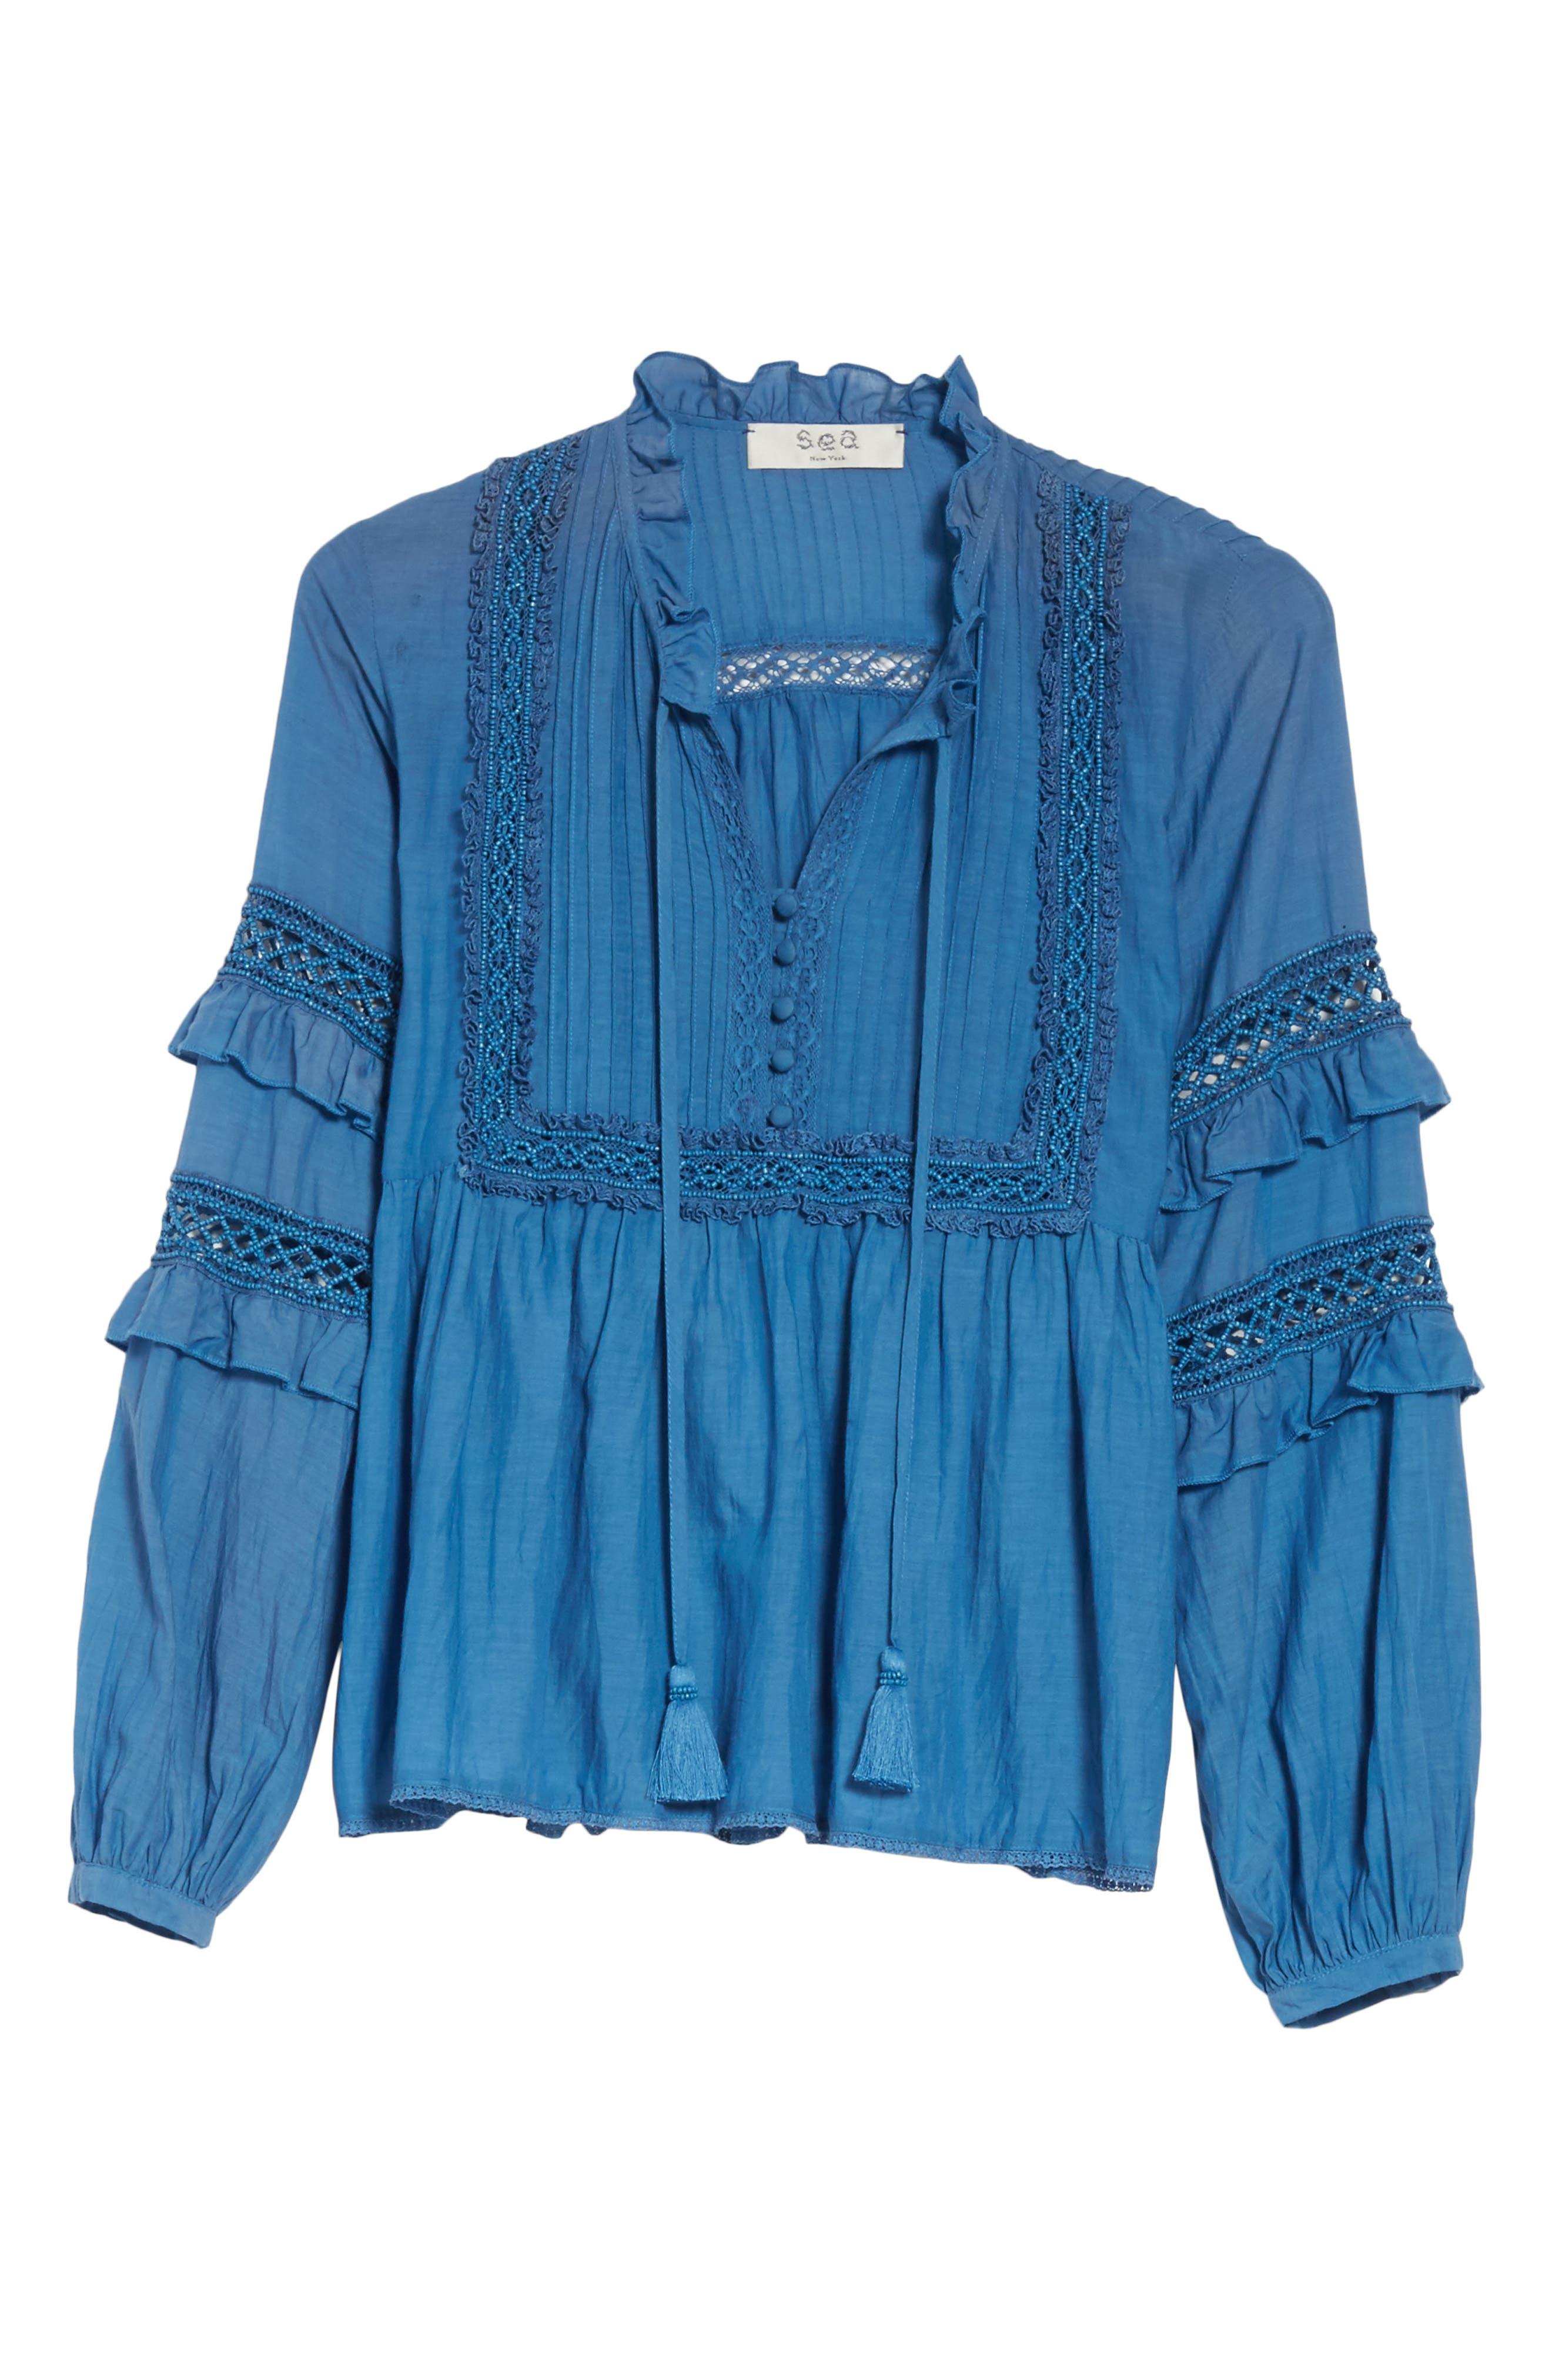 Adaline Ruffle Cotton Blouse,                             Alternate thumbnail 7, color,                             Blue